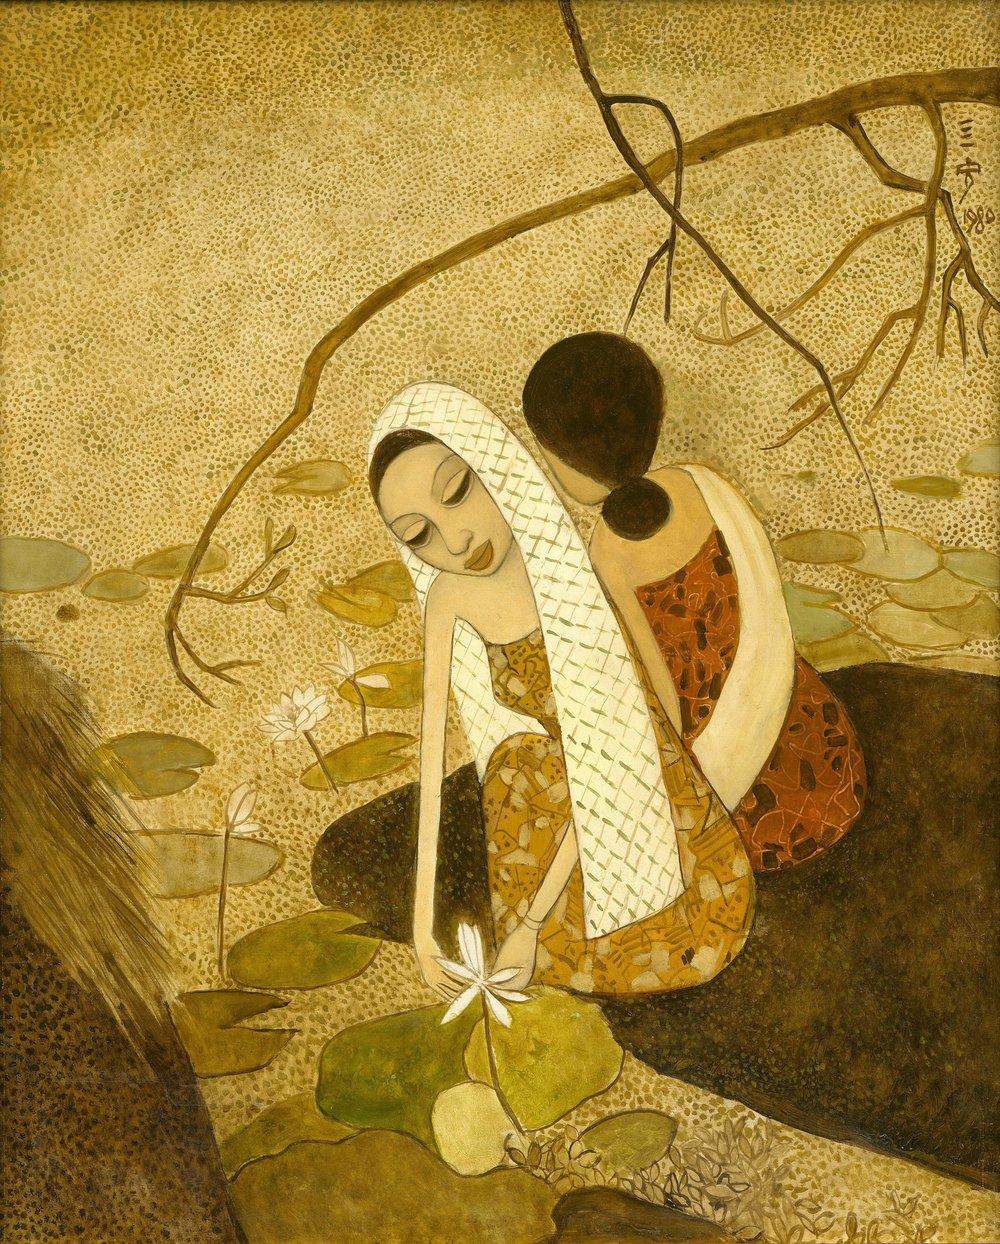 Cheong Soo Pieng (1917 - 1983